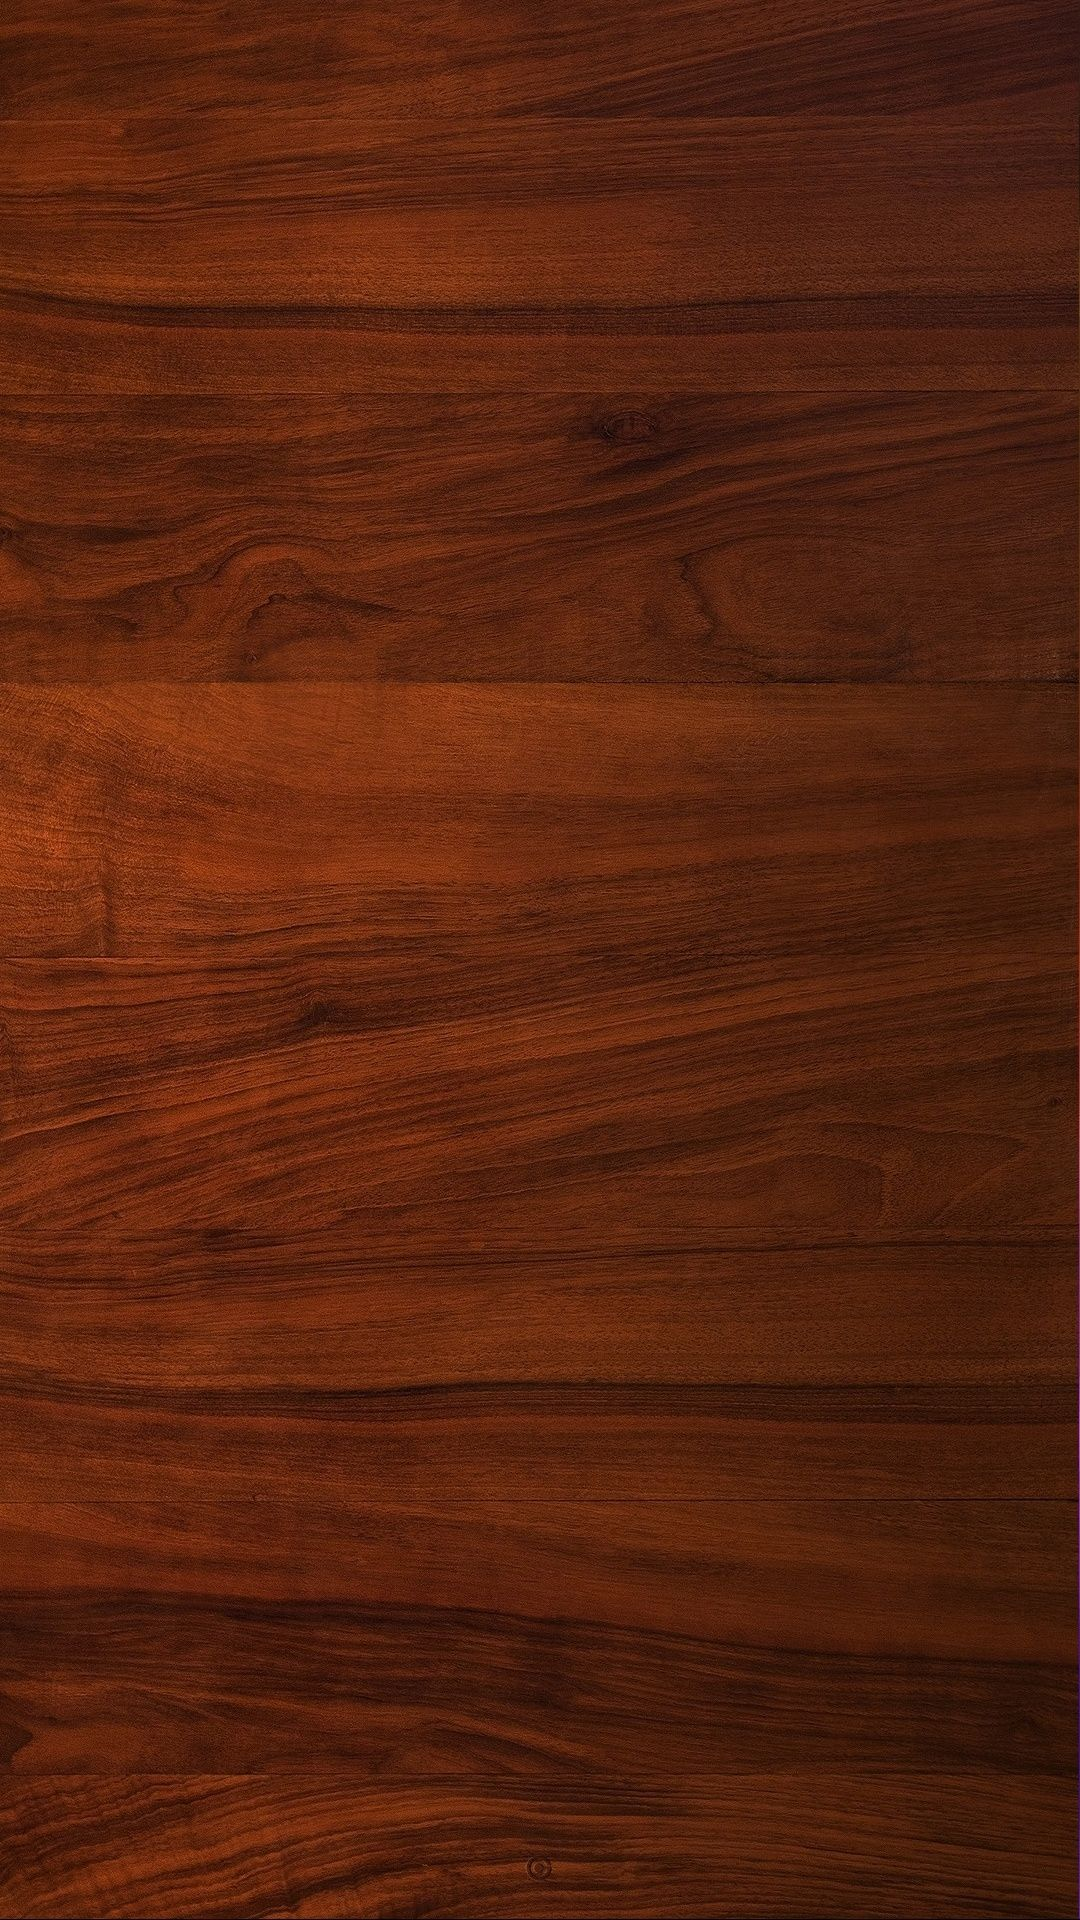 cherry wood pattern texture iphone 6 plus hd wallpaper